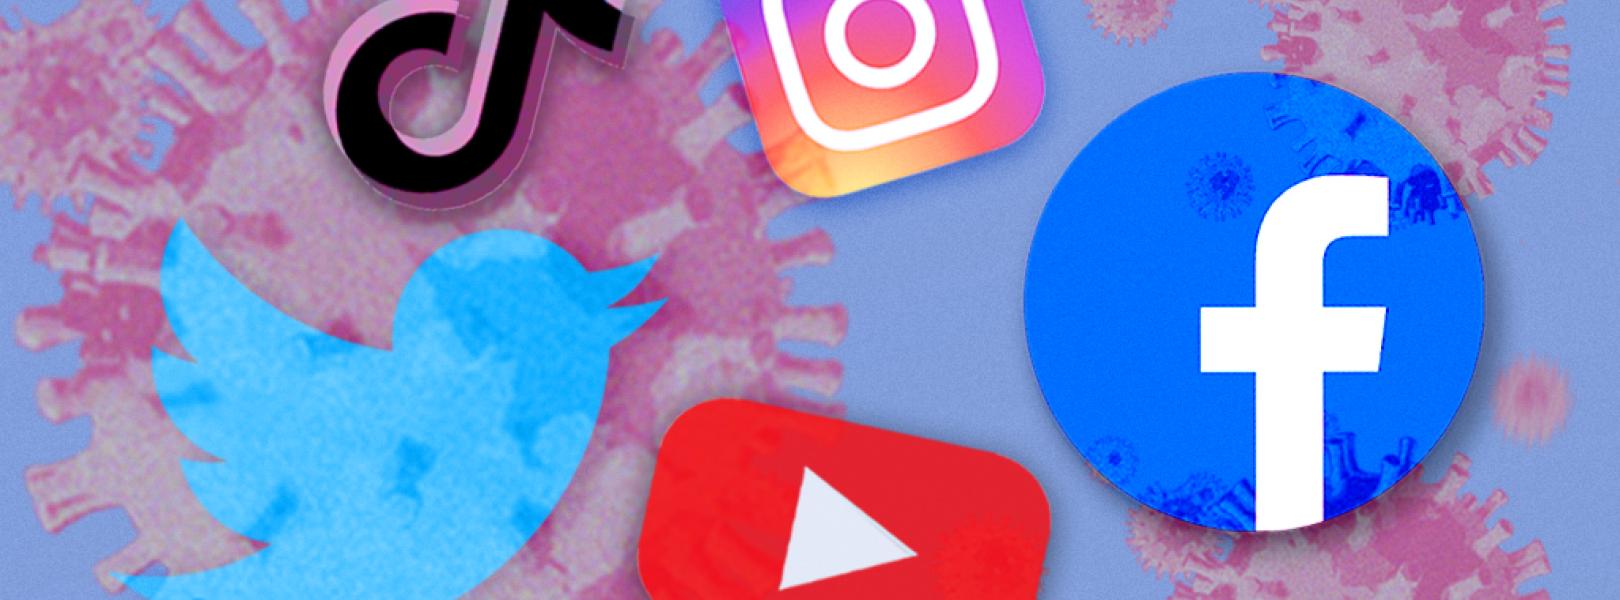 Coronavirus TikTok Instagram YouTube Facebook Instagram